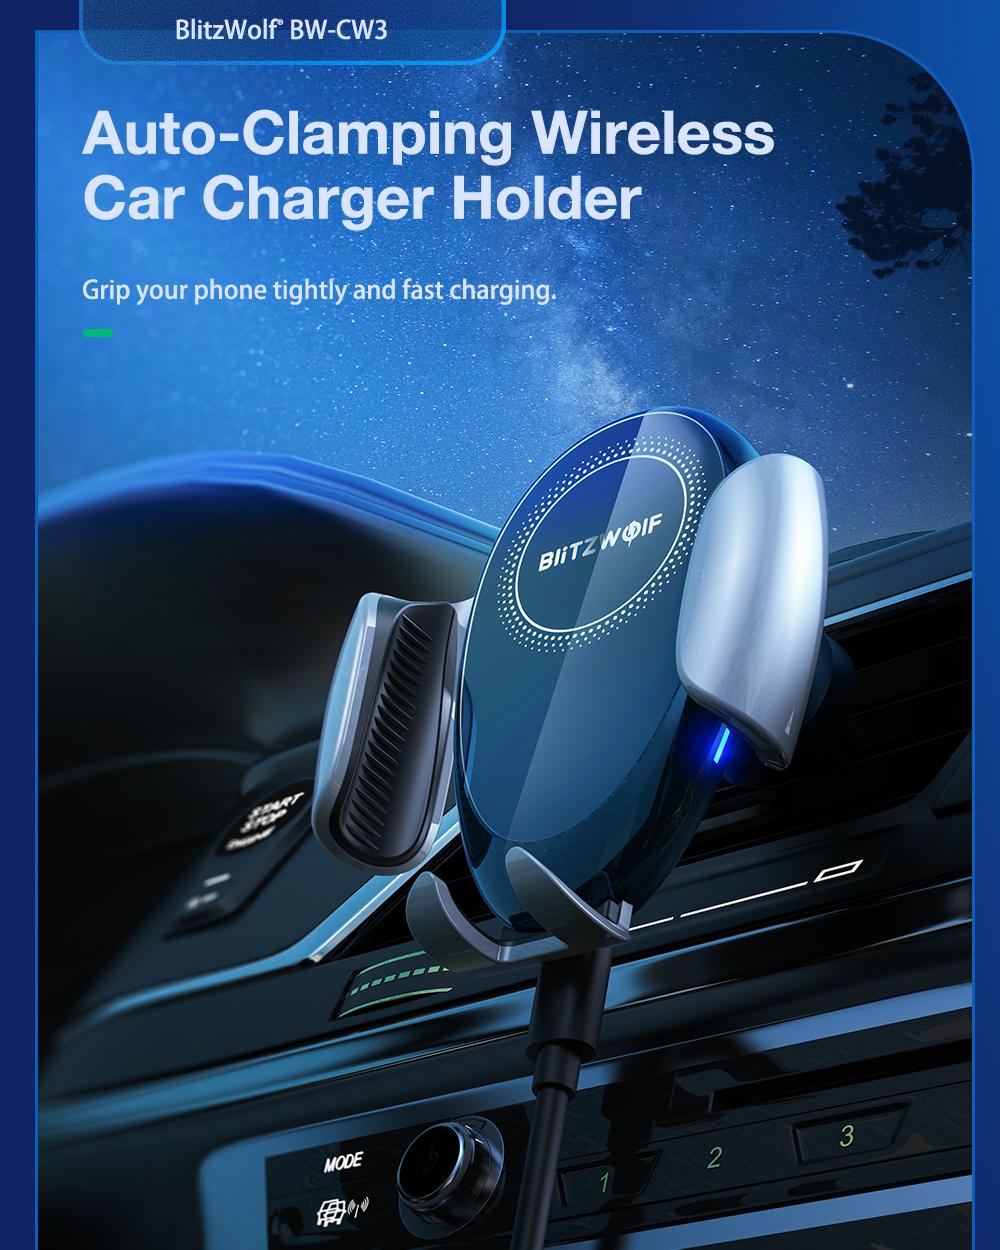 blitzwolf BW-CW3 car IQ charger